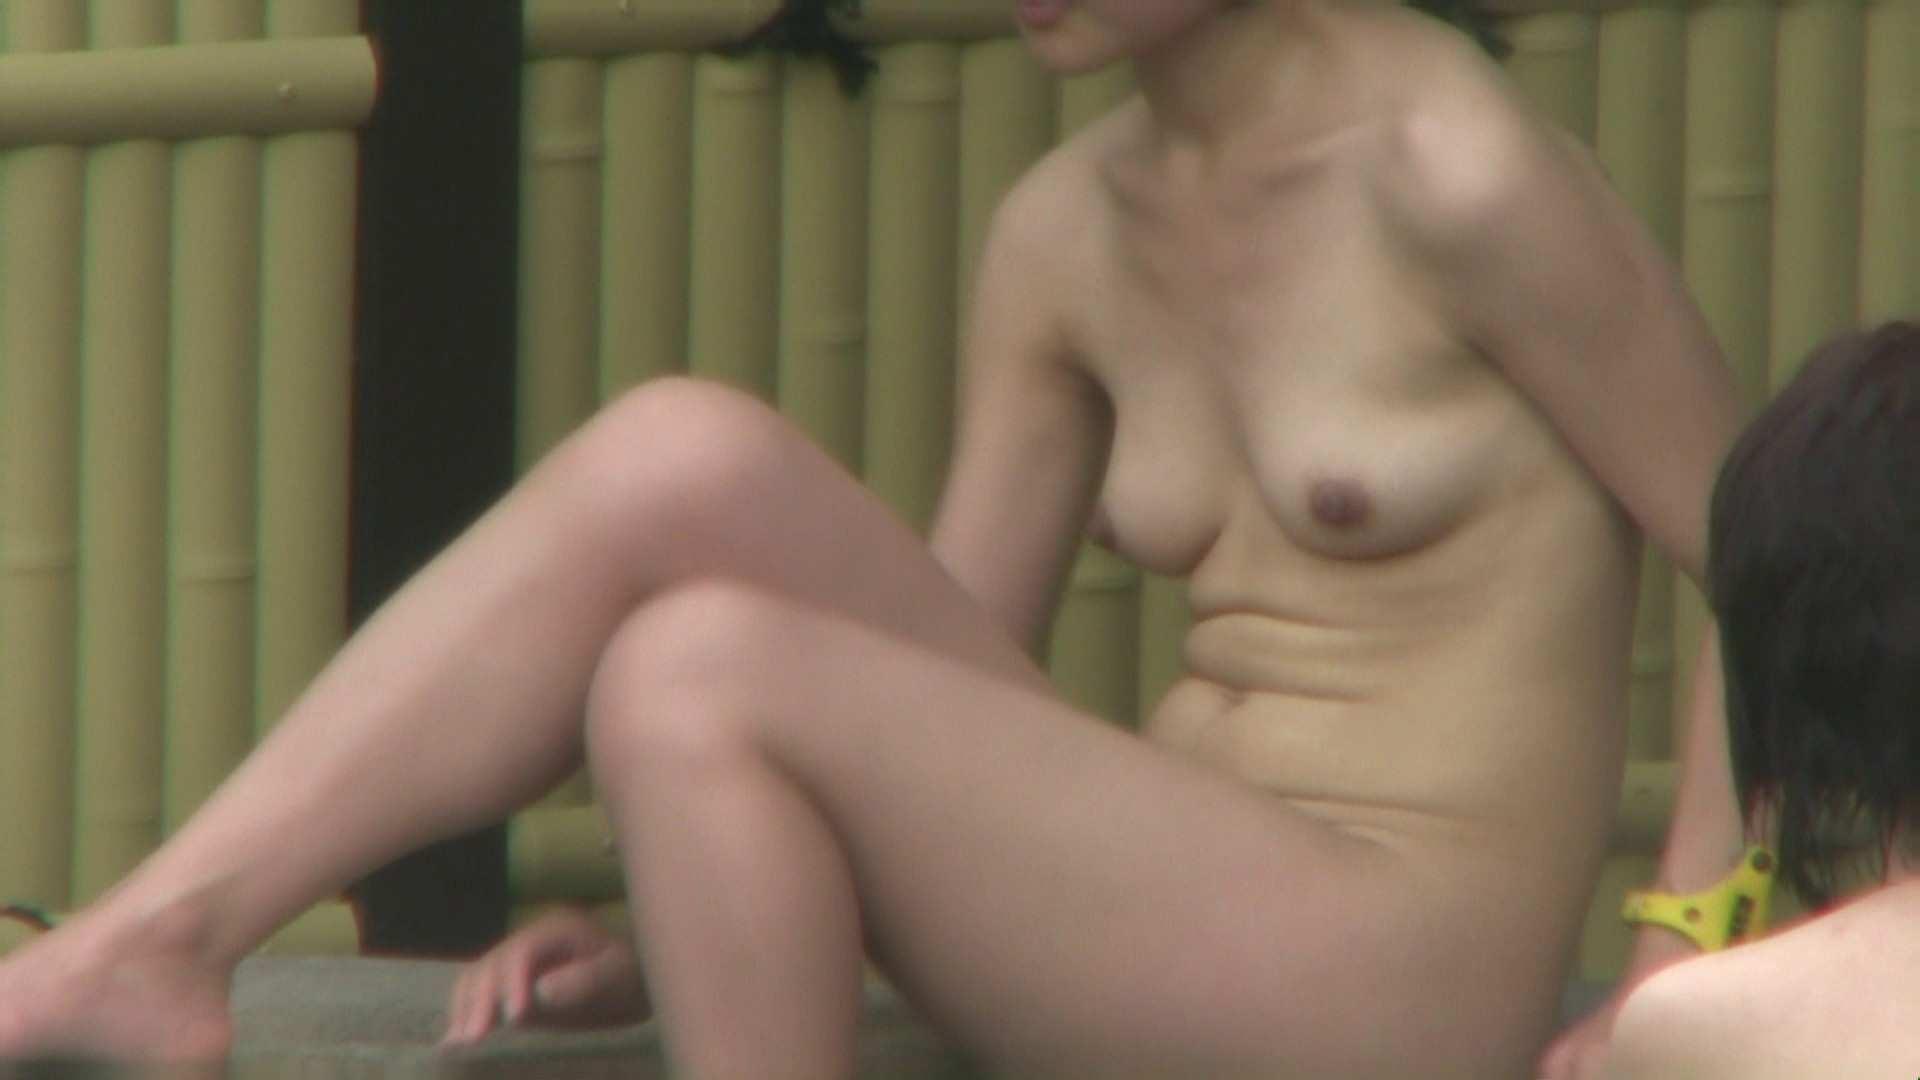 Aquaな露天風呂Vol.74【VIP限定】 露天風呂編 | 盗撮シリーズ  103PIX 17